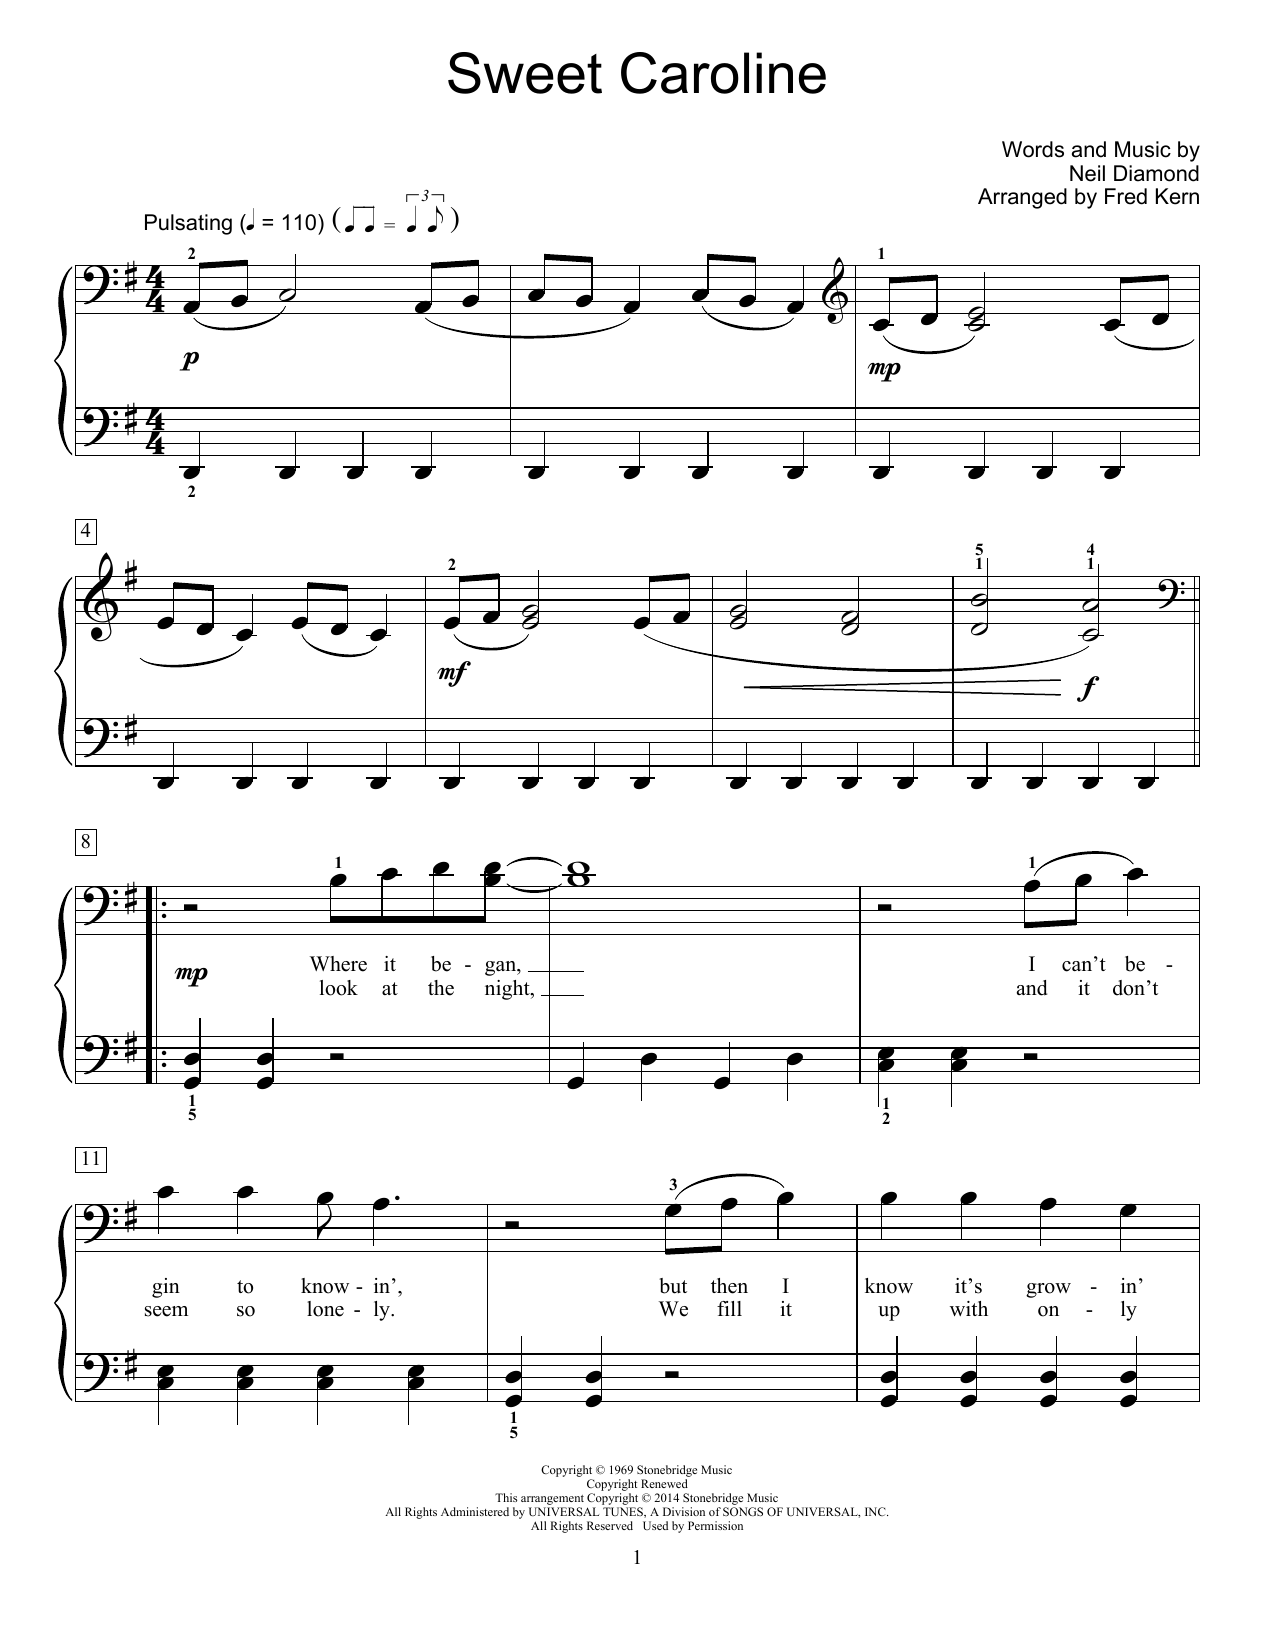 Hal Leonard Student Piano Library - Popular Piano Solos - Book 4 by No Composer